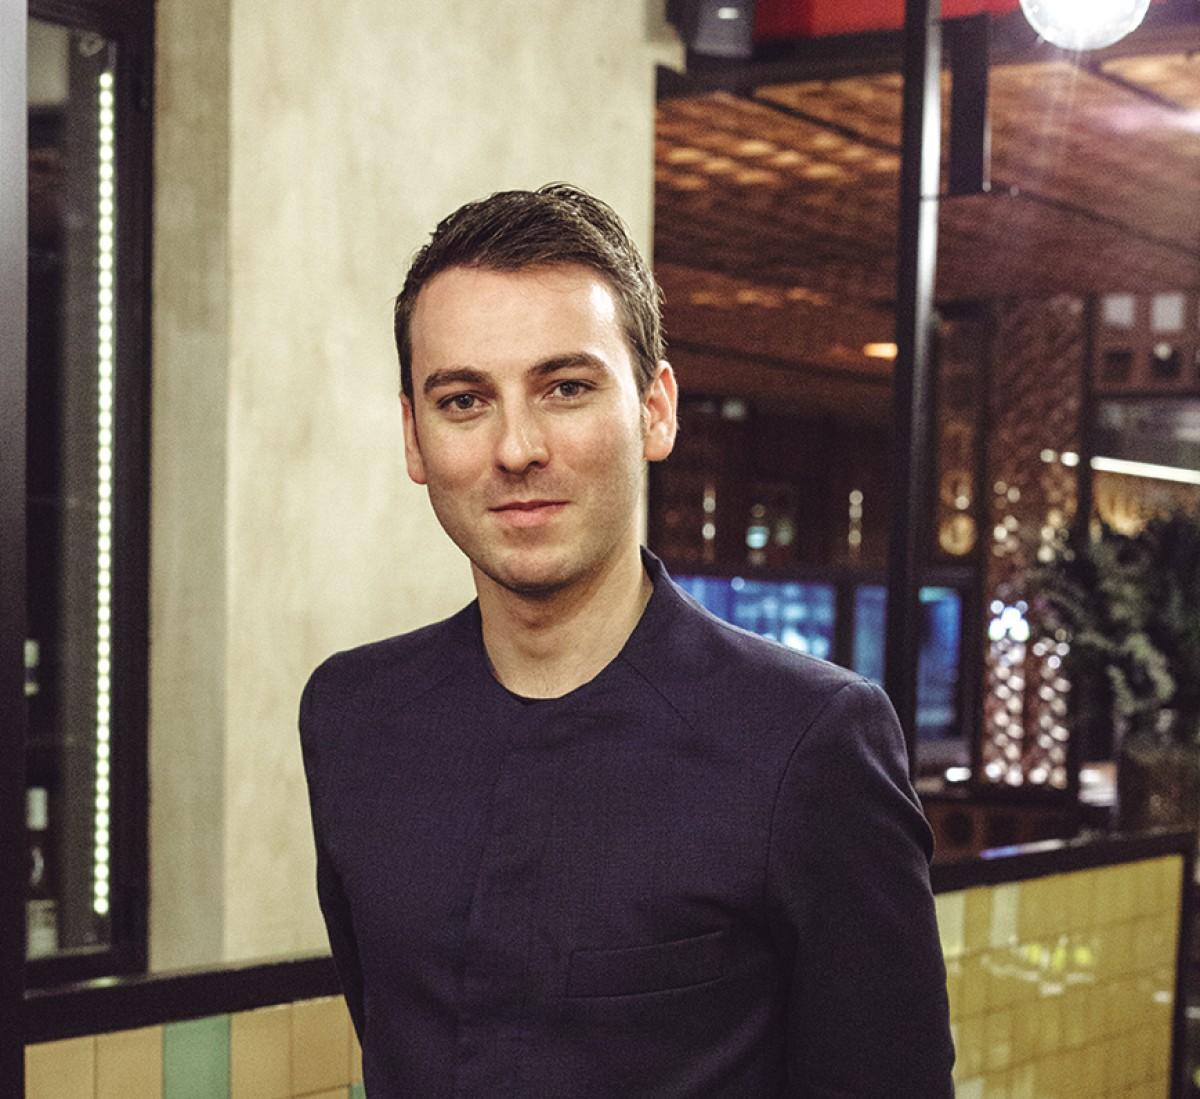 Rubén Pol, sommelier del restaurant Disfrutar